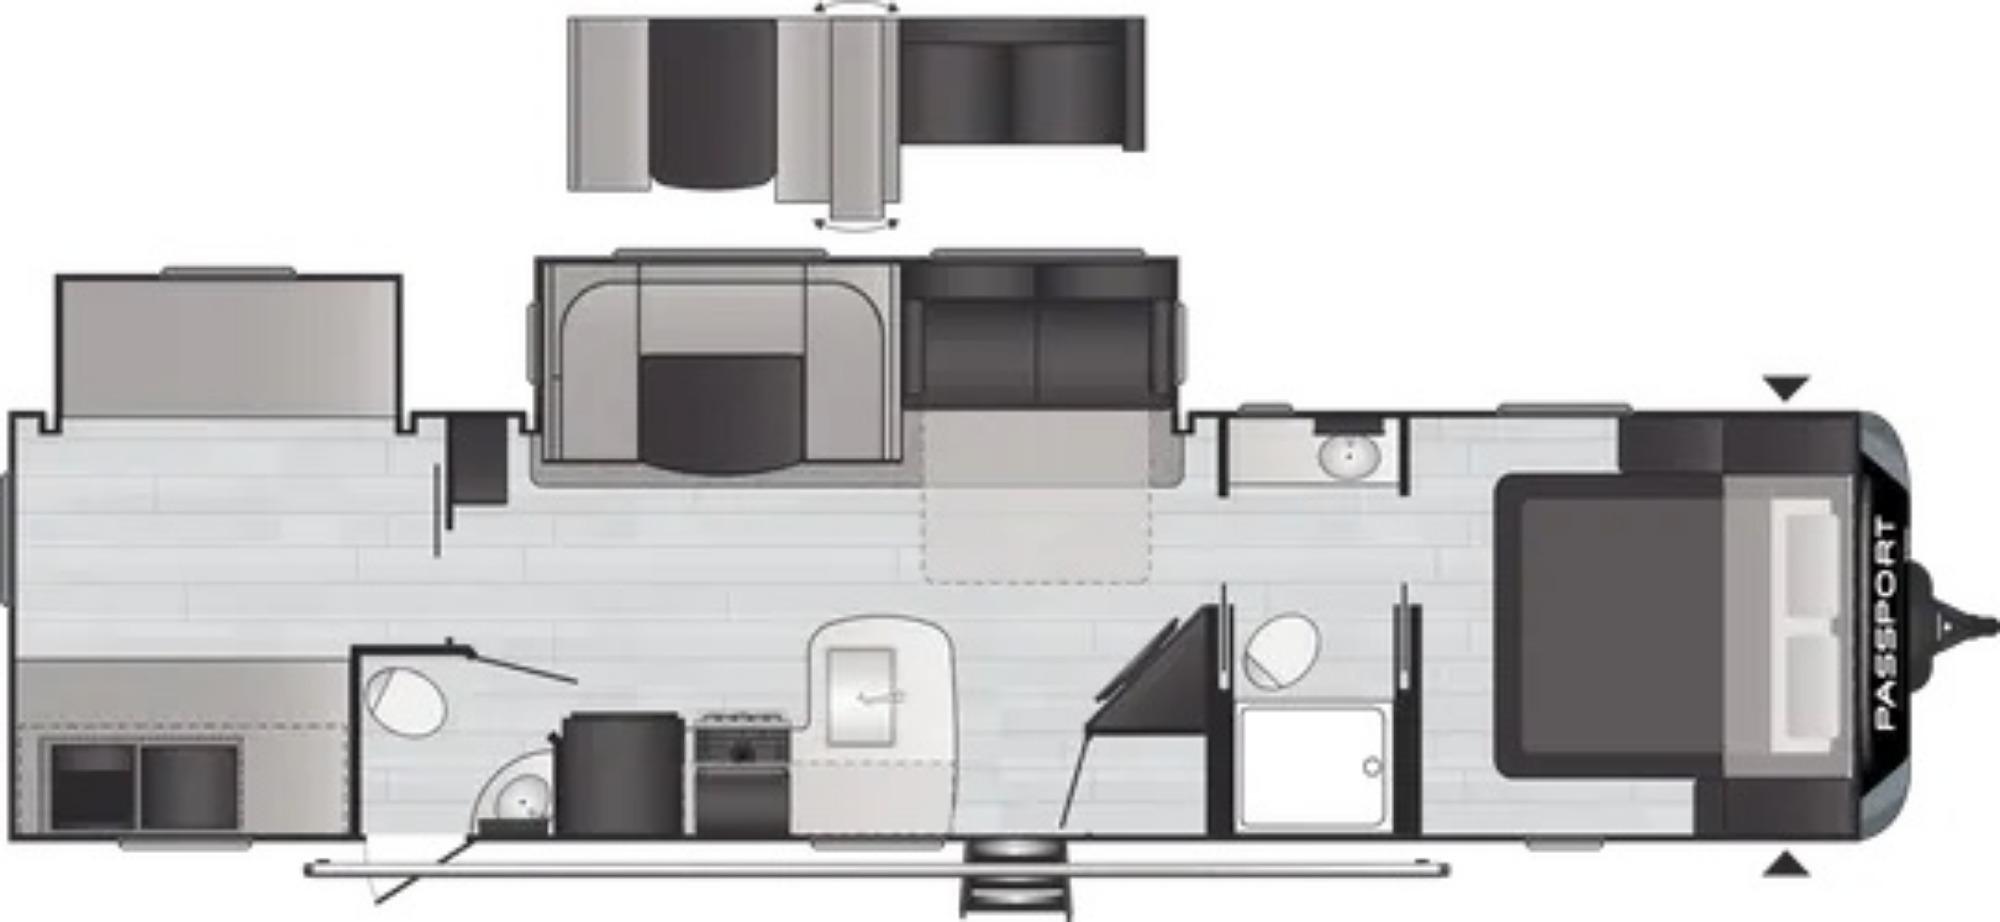 View Floor Plan for 2022 KEYSTONE PASSPORT 3352BH